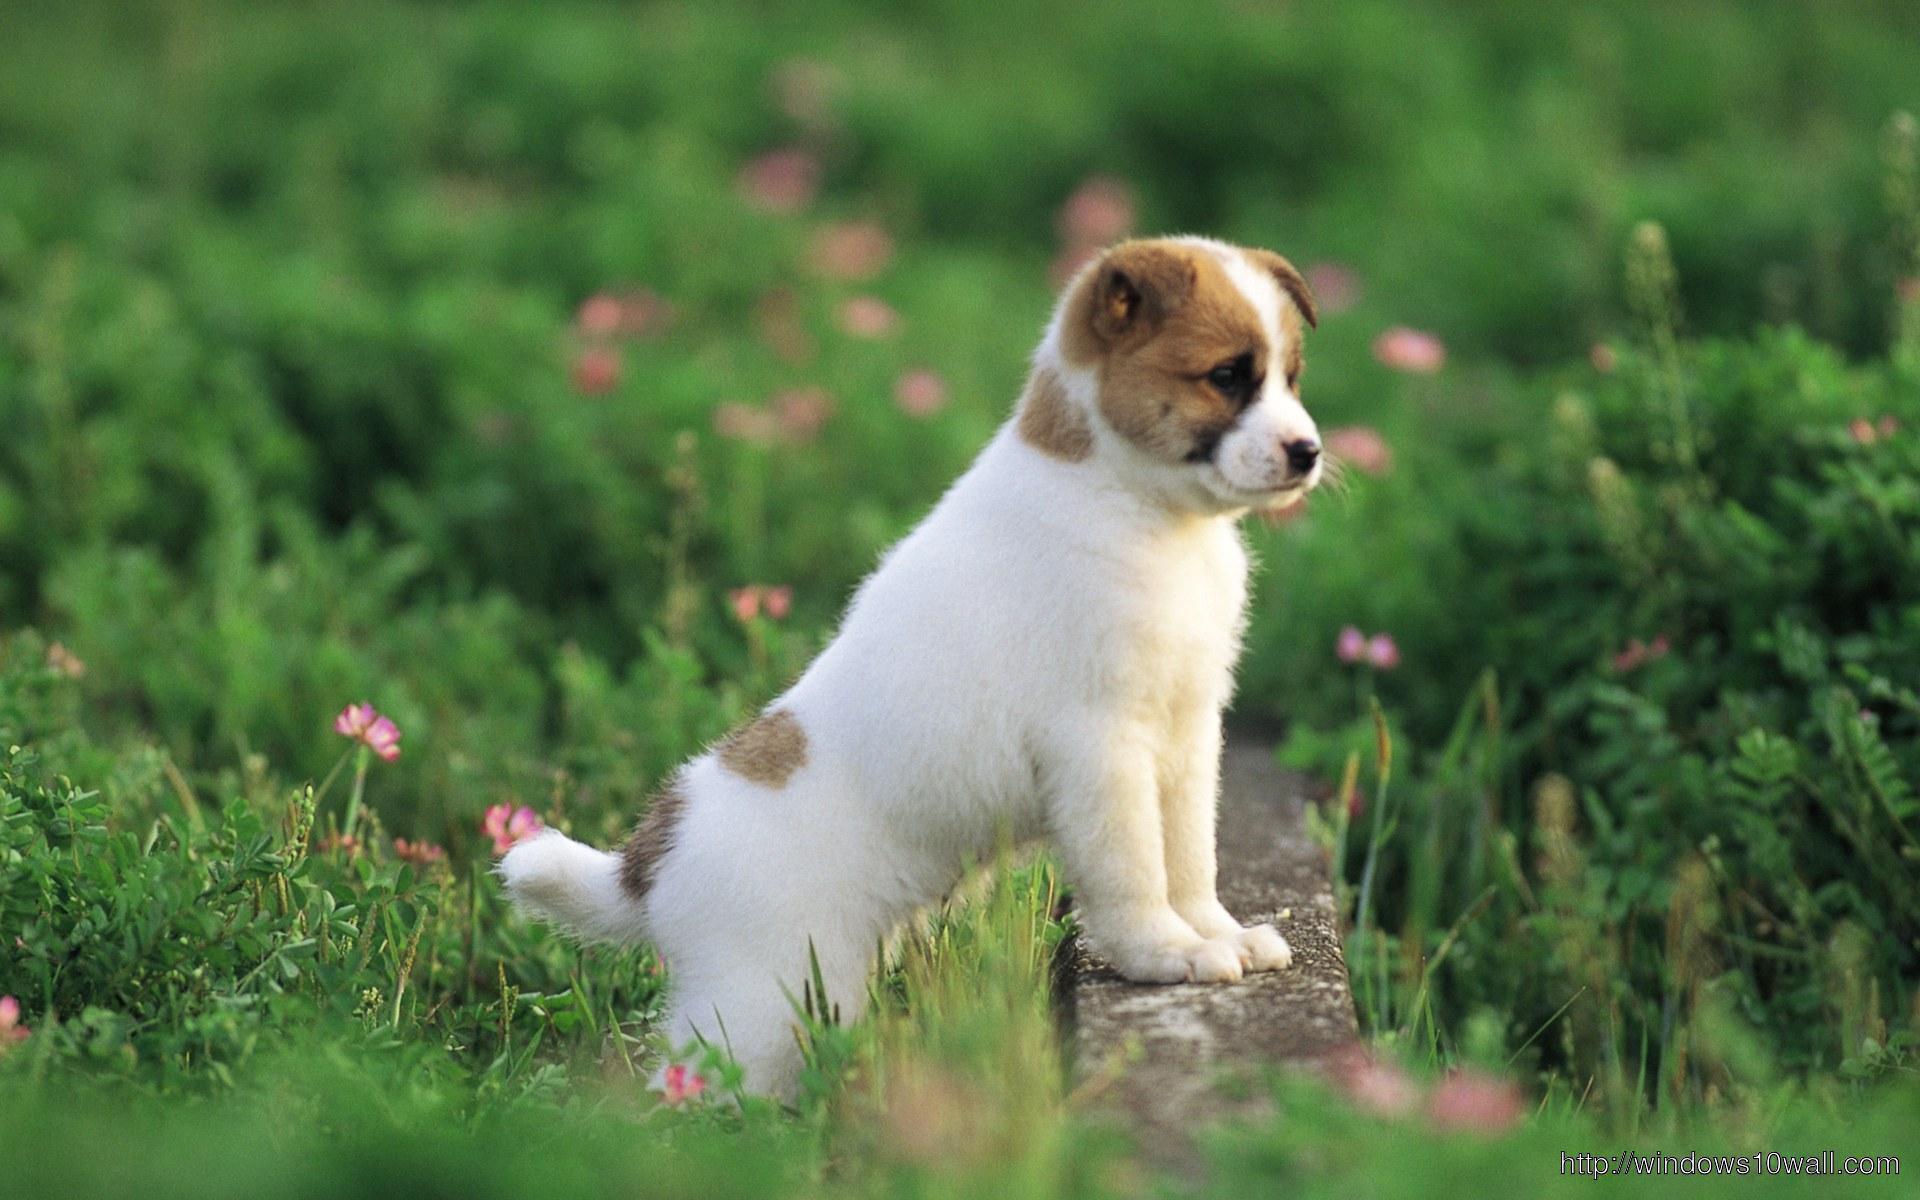 Cute-Puppy-Small-Dog-HD-Free-Wallpaper